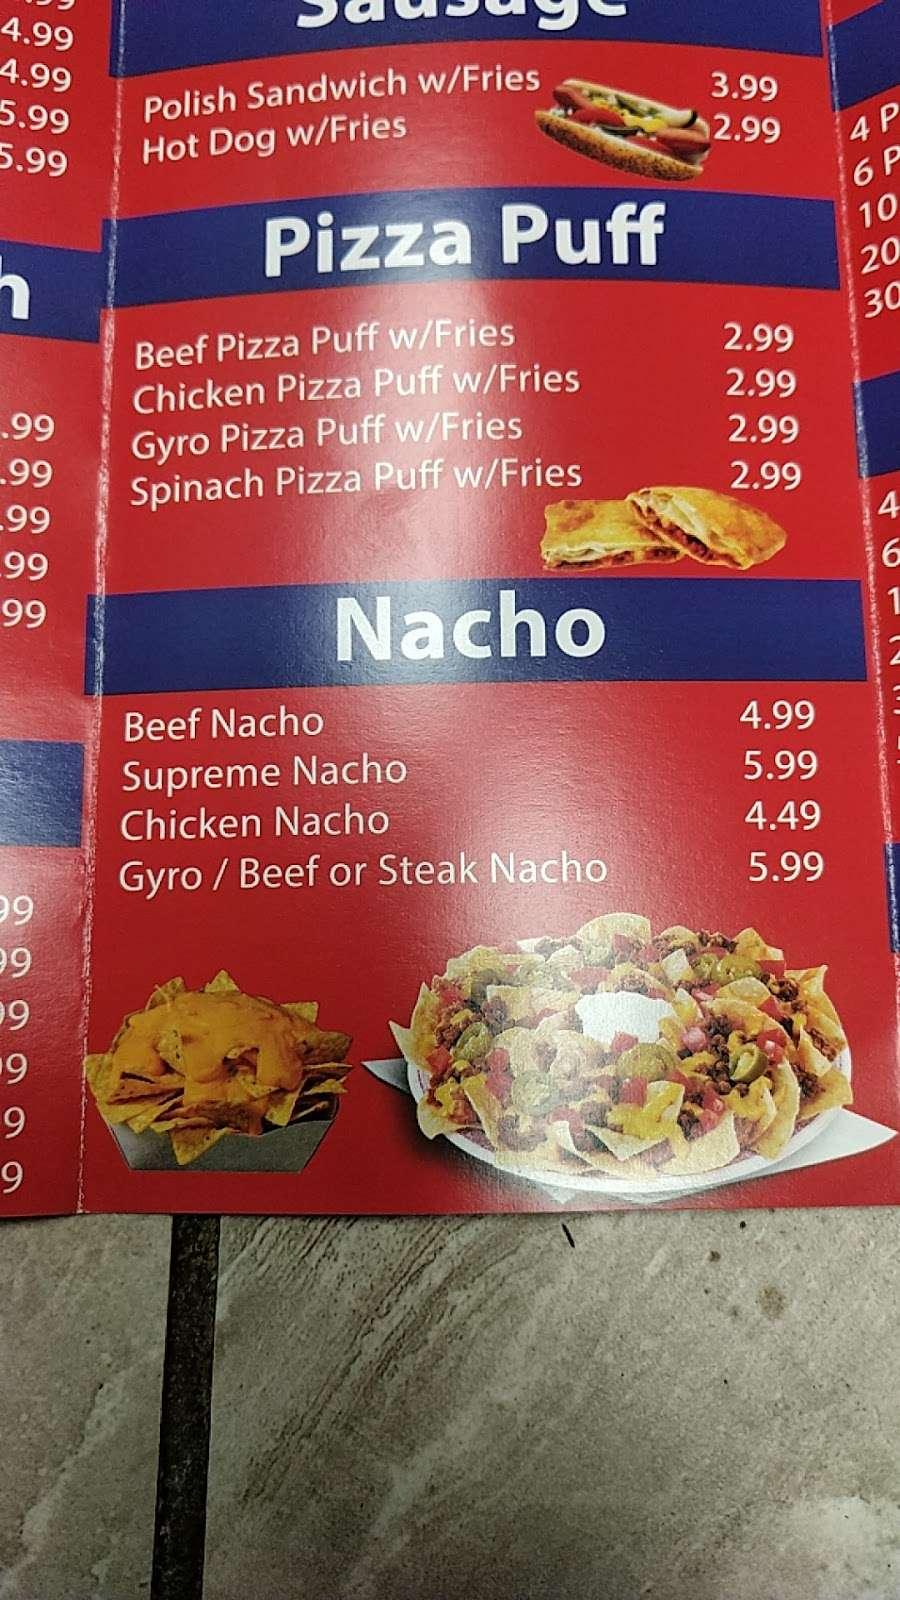 Tasty Chicken & Salad - restaurant    Photo 8 of 10   Address: 159 W 95th St, Chicago, IL 60628, USA   Phone: (773) 840-3114